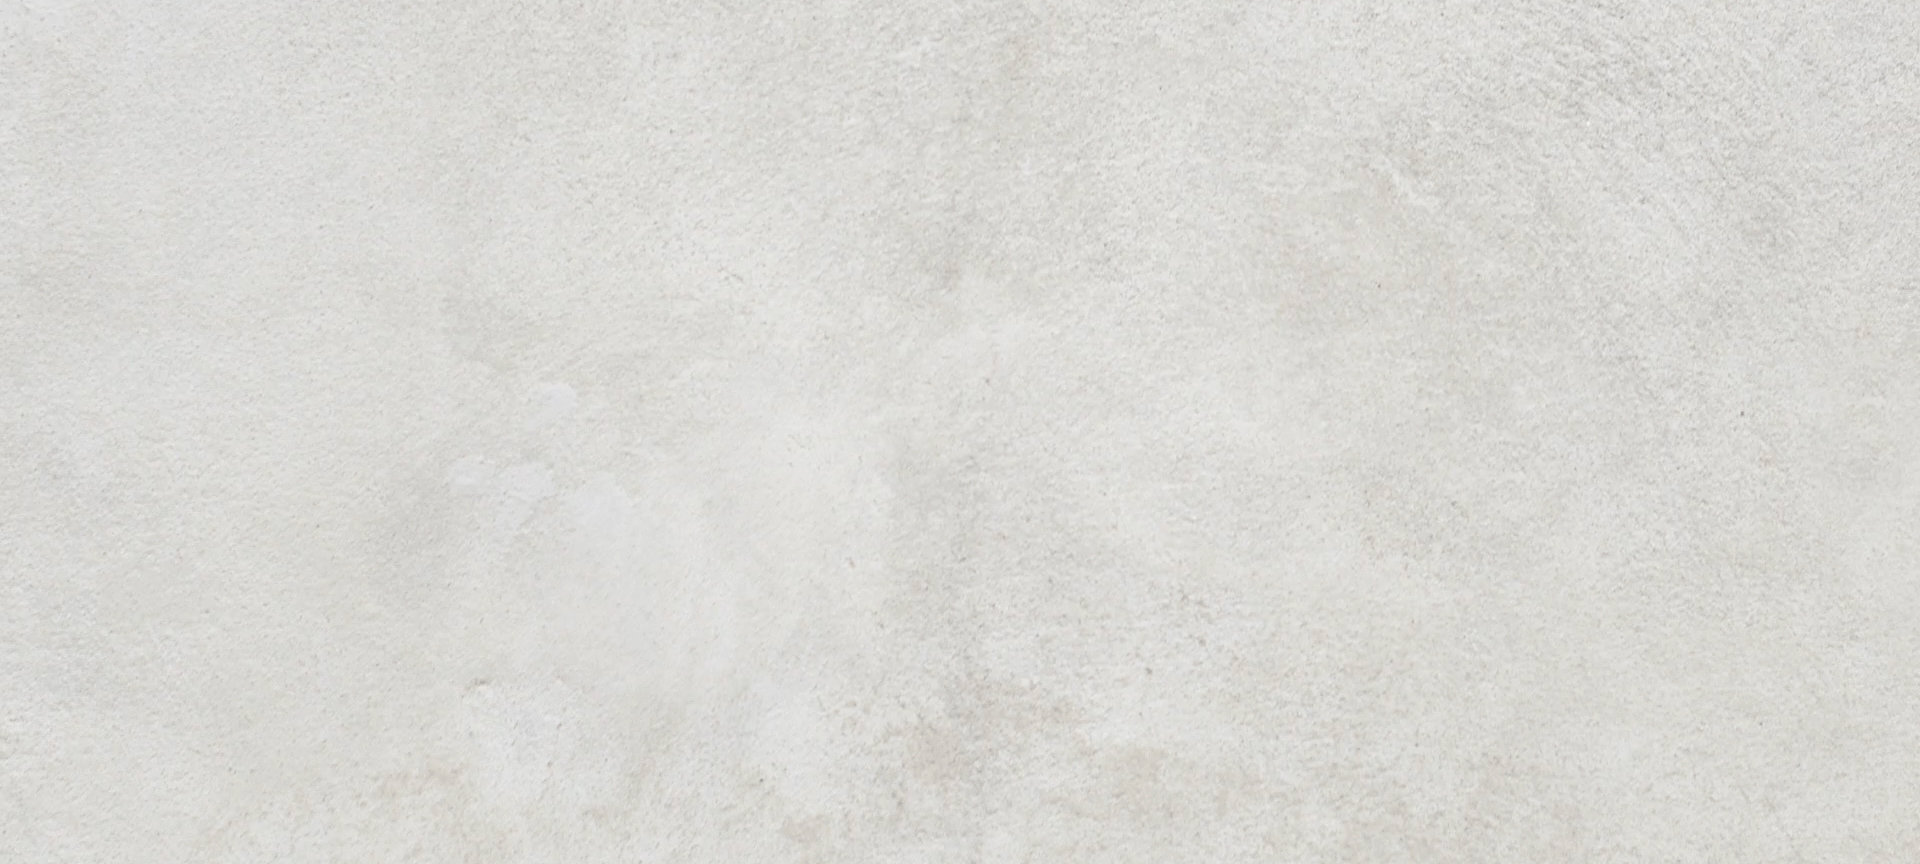 Web Wall Texture.jpg